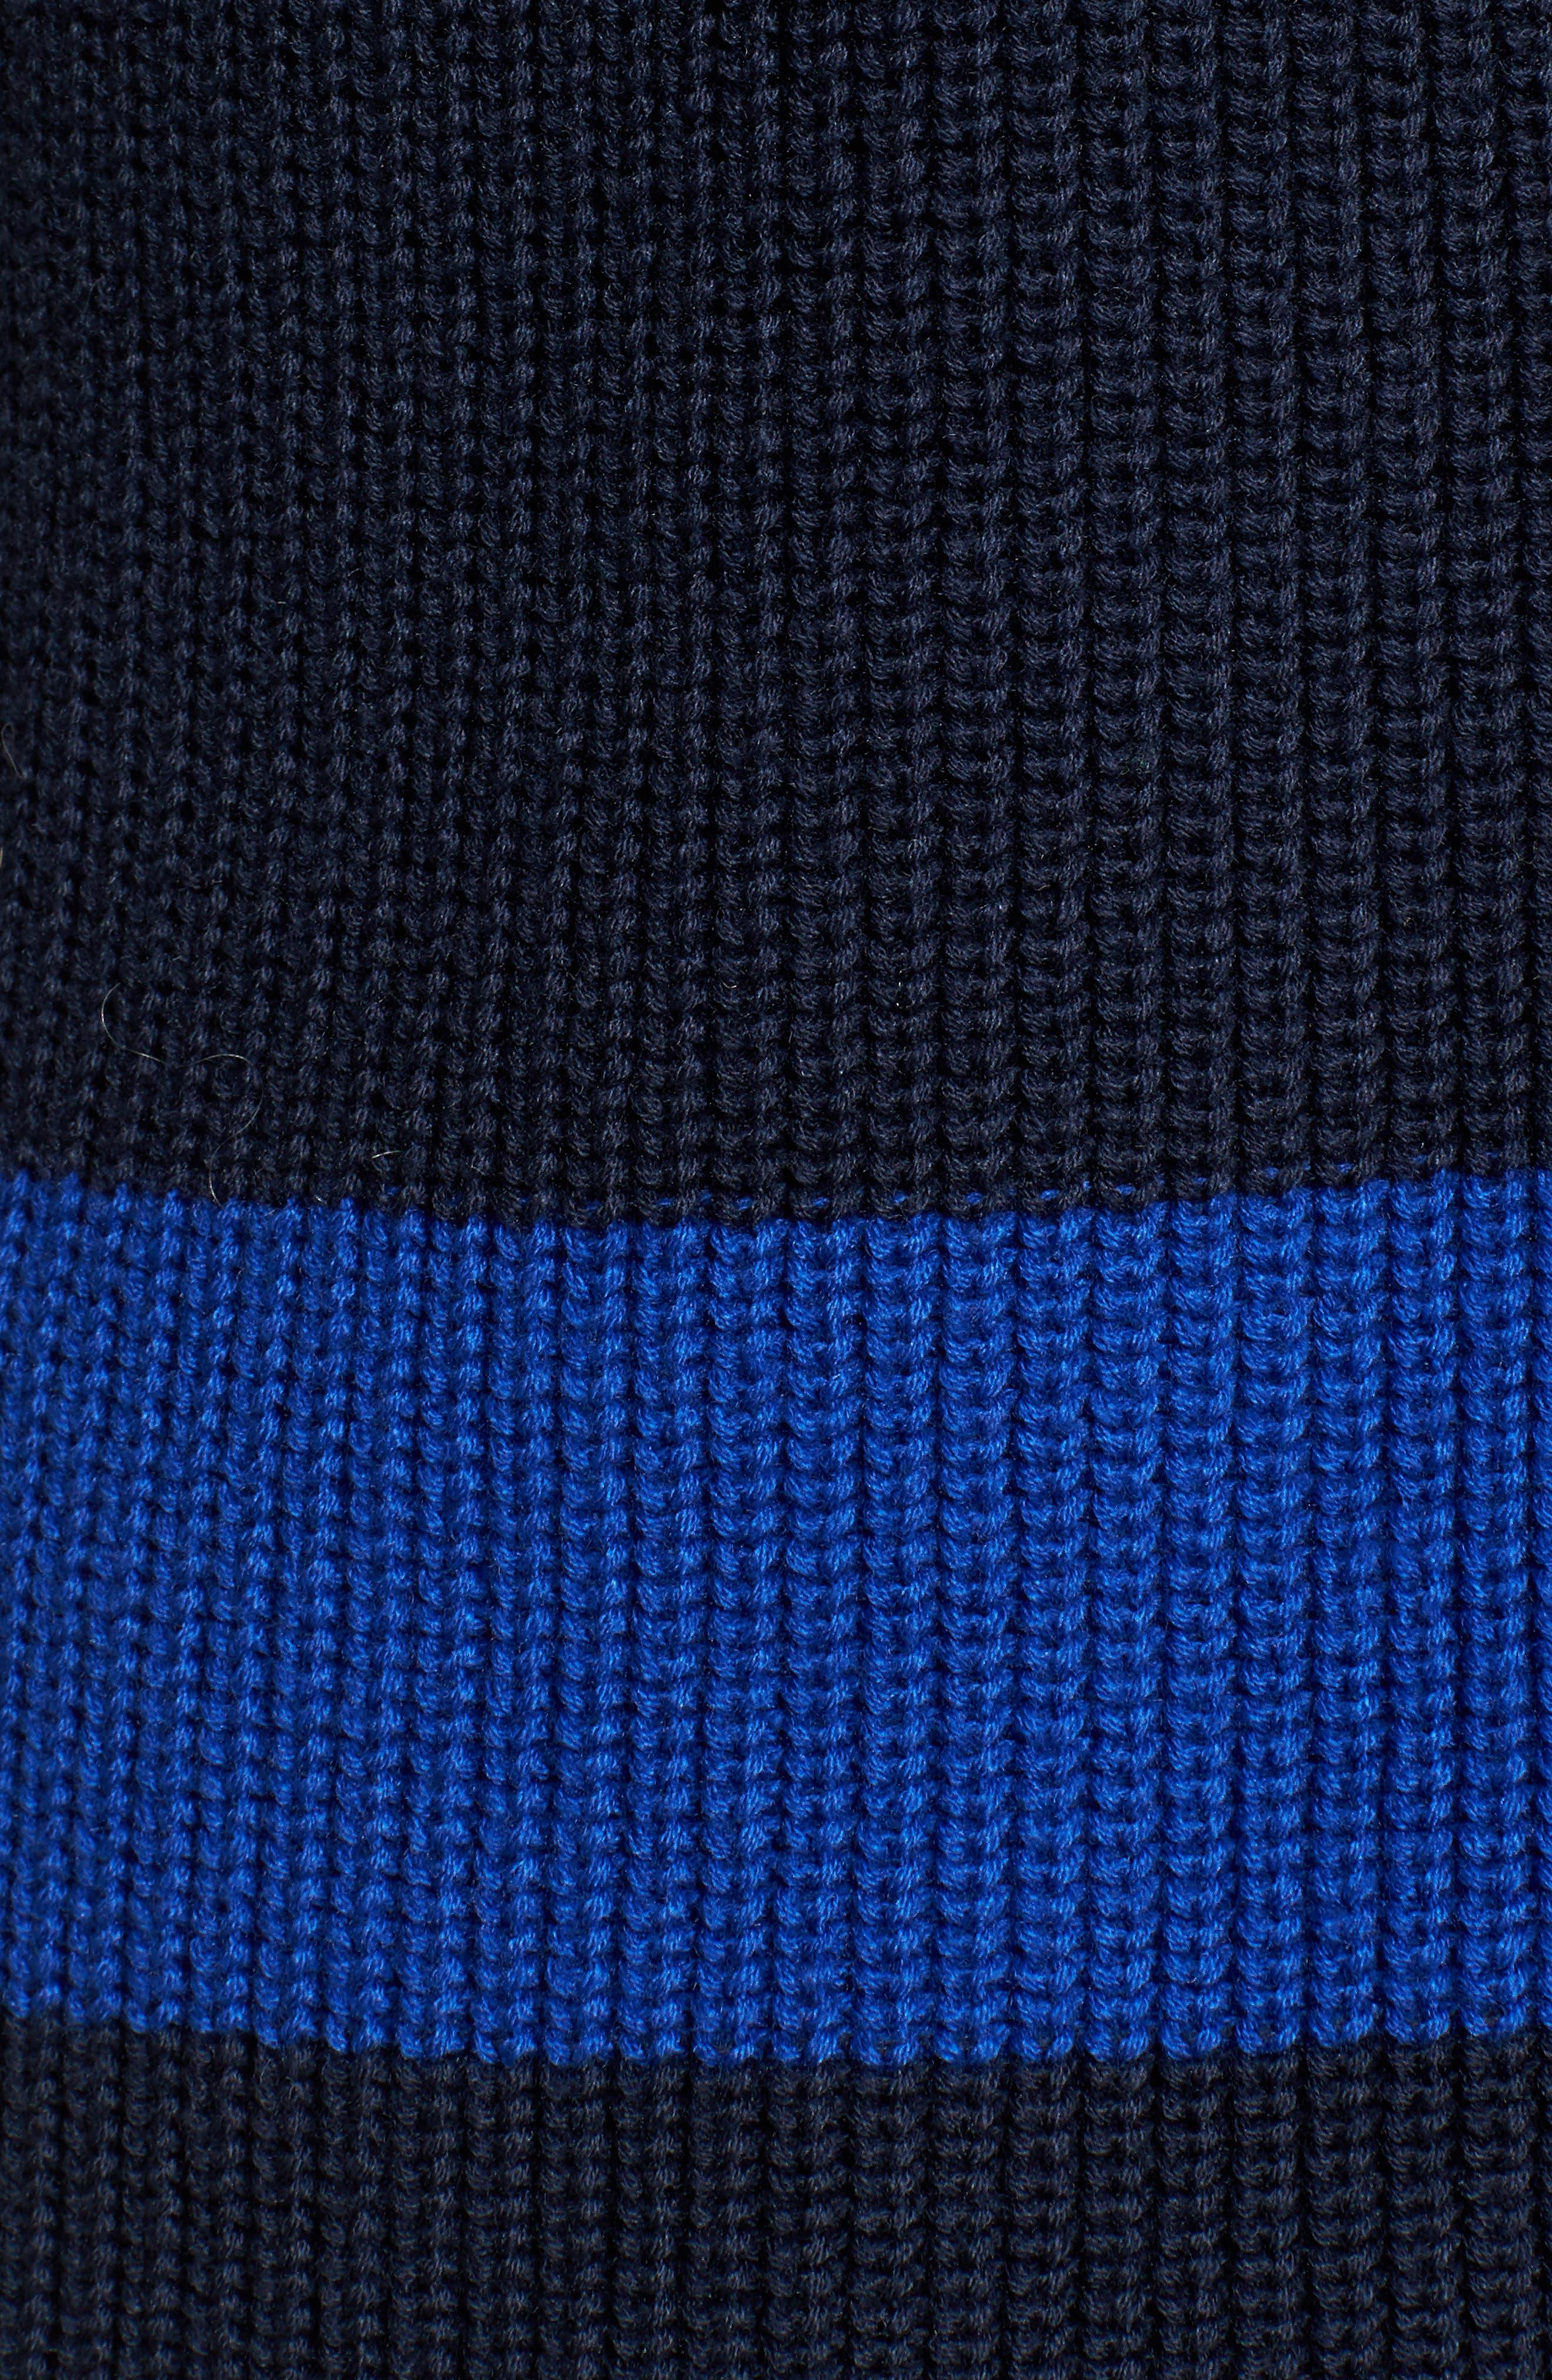 Shaker Knit Cardigan,                             Alternate thumbnail 6, color,                             Navy- Blue Colorblock